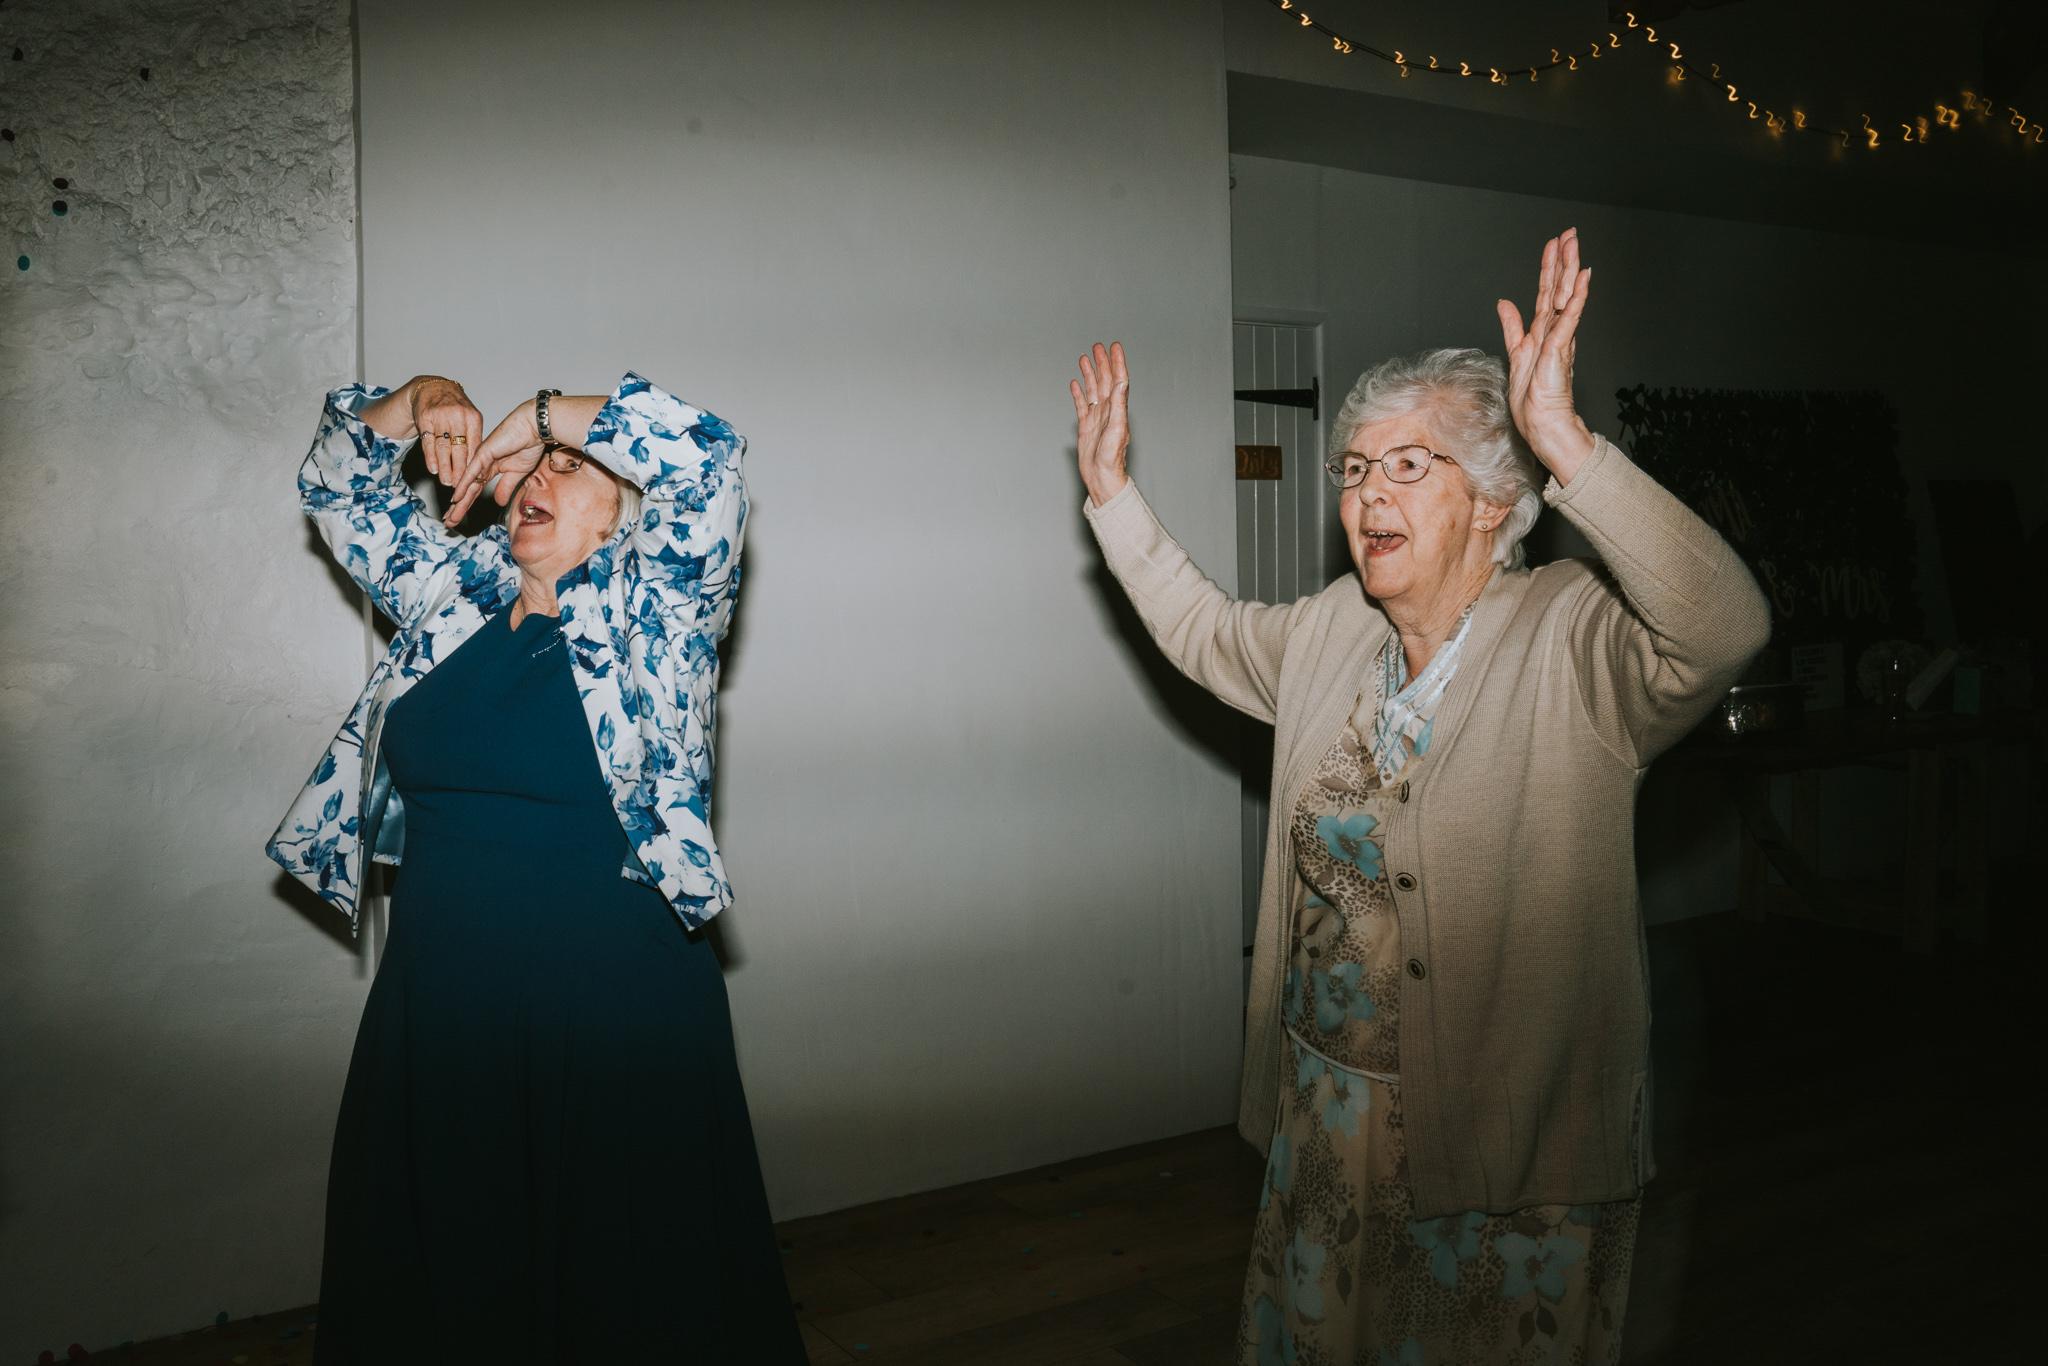 grace-sam-old-barn-clovelly-devon-wedding-photographer-grace-elizabeth-essex-suffolk-norfolk-wedding-photographer (131 of 132).jpg